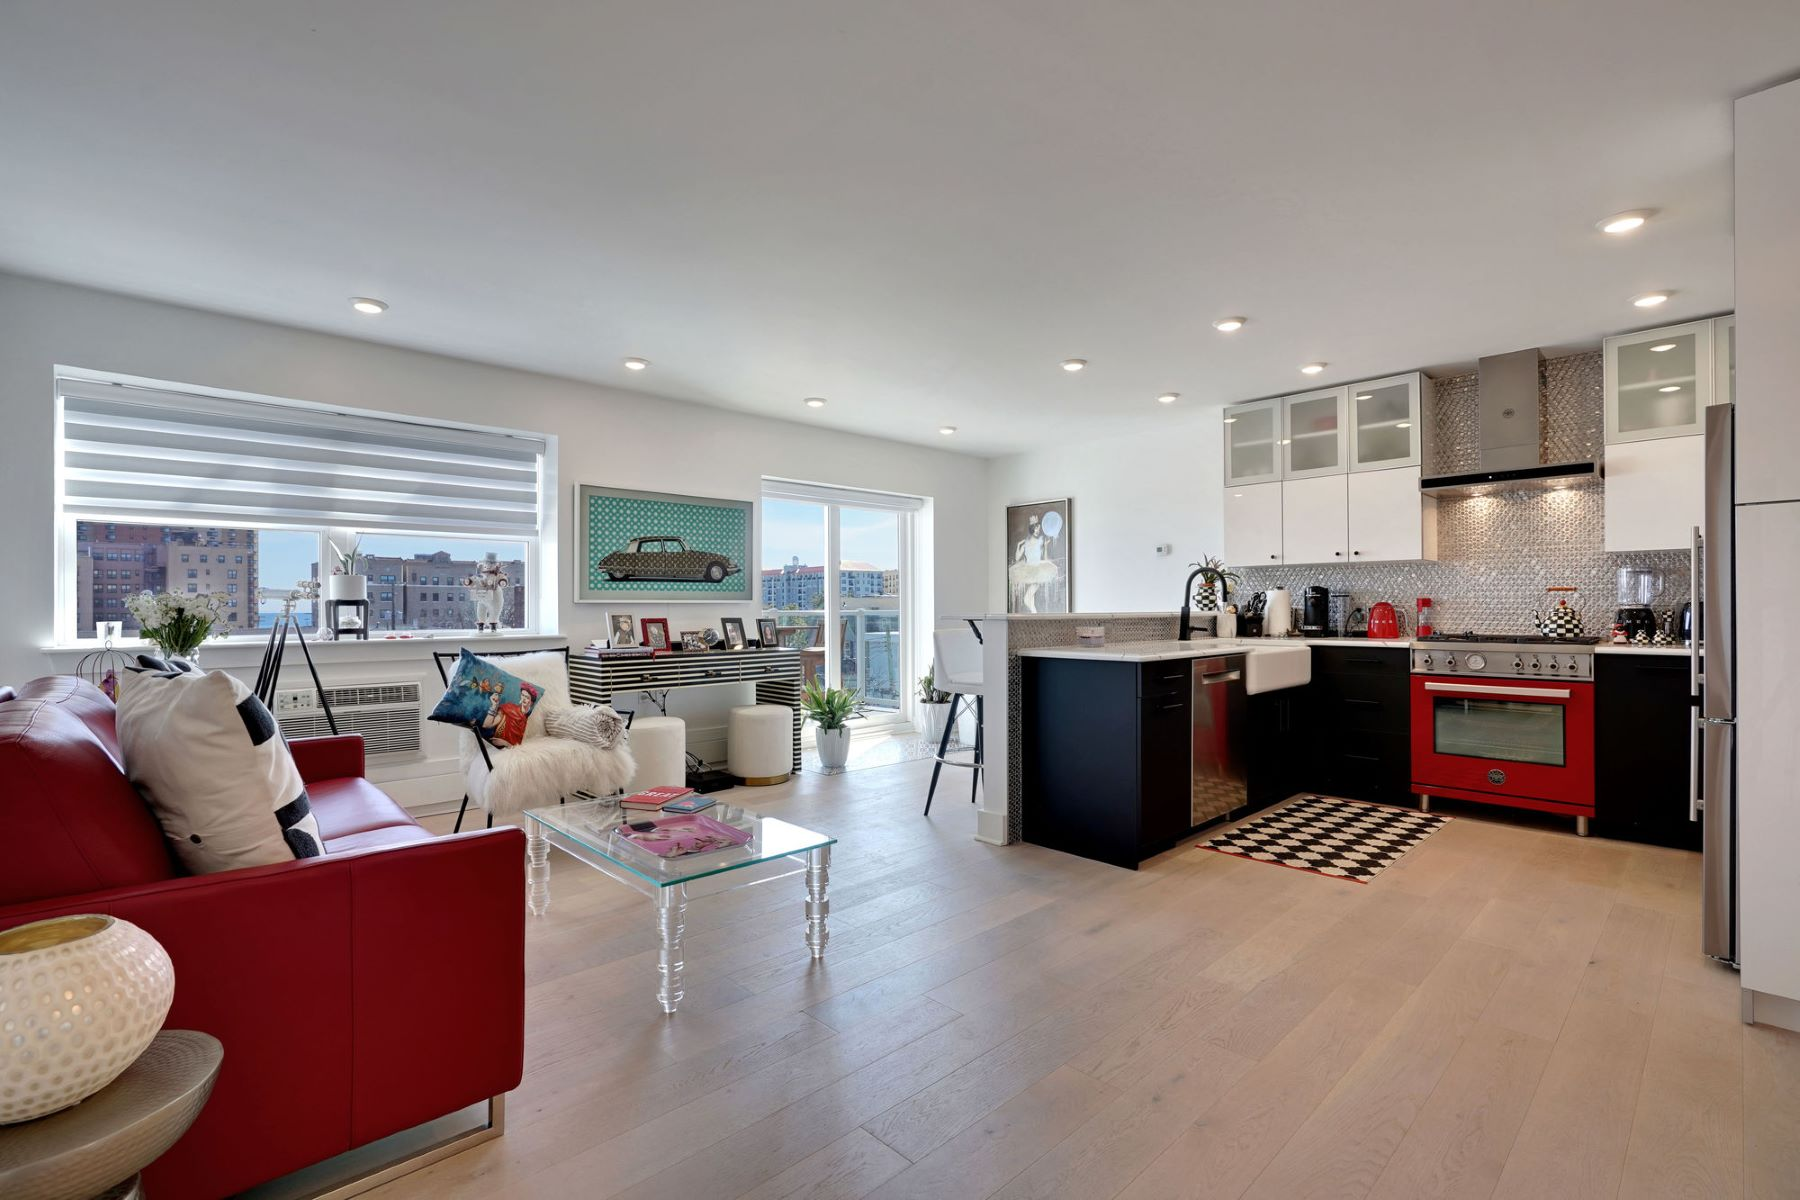 Condominiums для того Продажа на OFFICE EXCLUSIVE PARK PLACE 1706 Park Avenue 4B Asbury Park, Нью-Джерси 07712 Соединенные Штаты